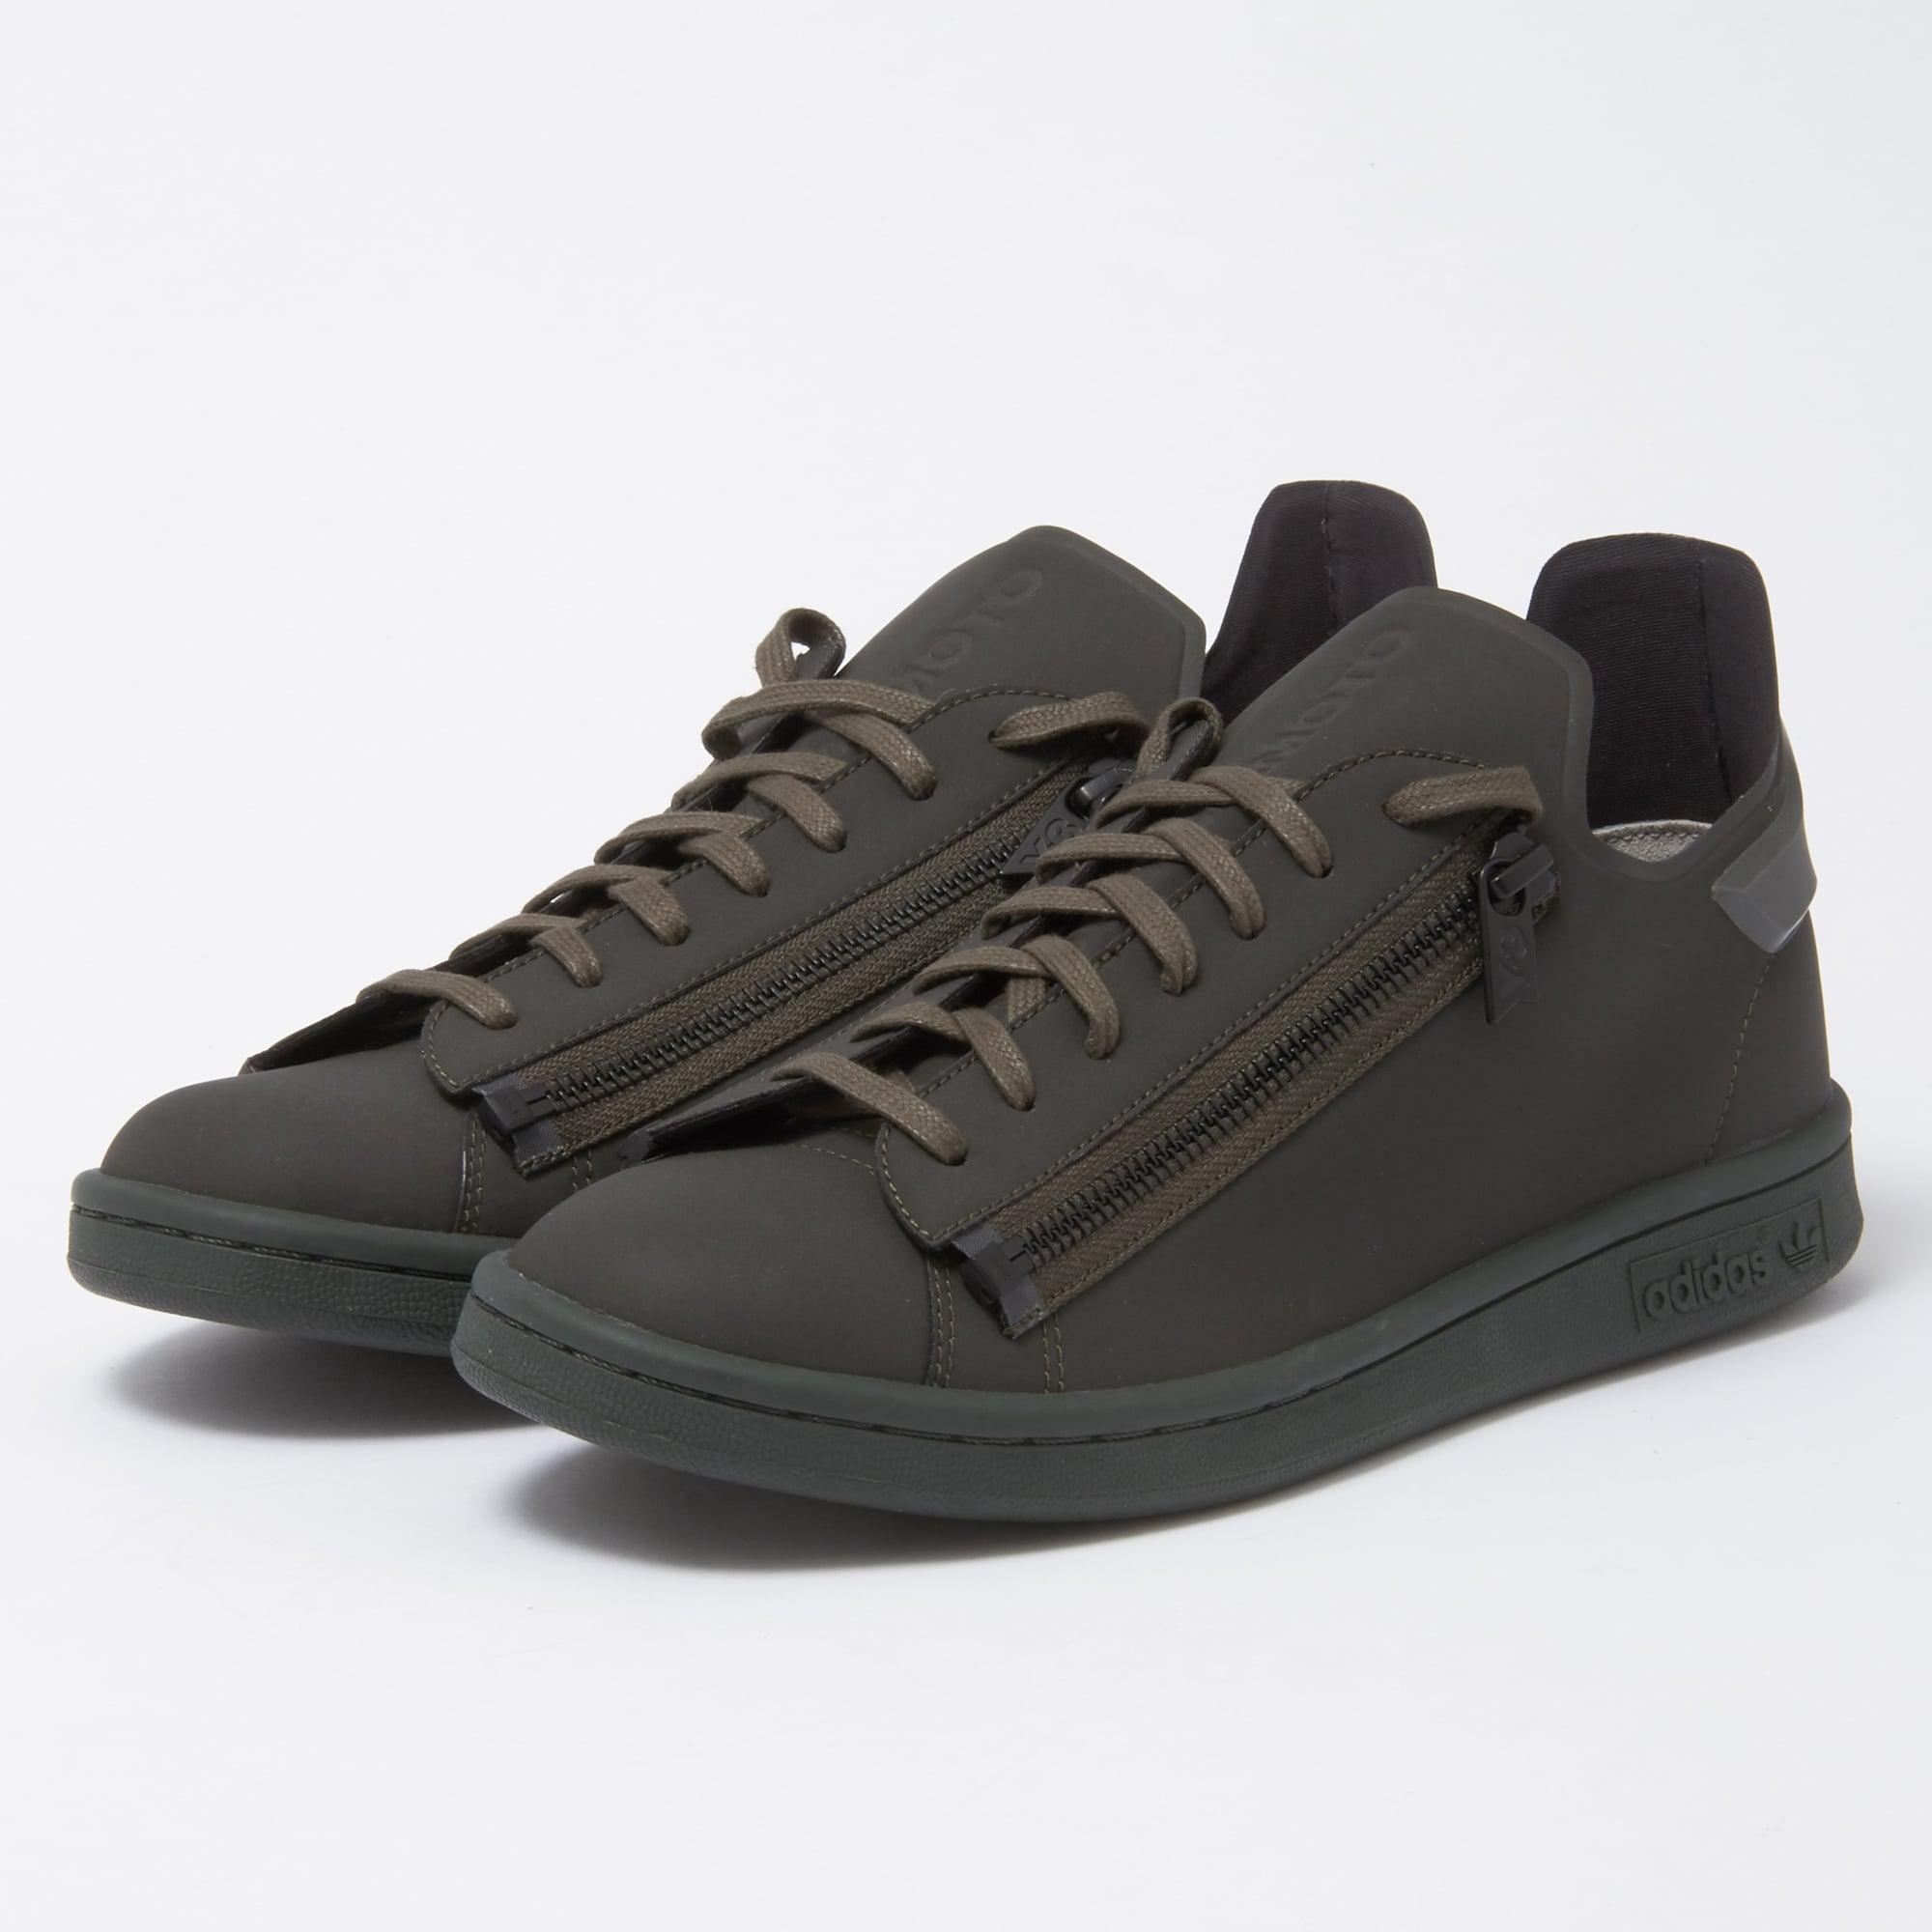 32dac7a98b98f Lyst - Y-3 Stan Zip - Black Olive in Black for Men